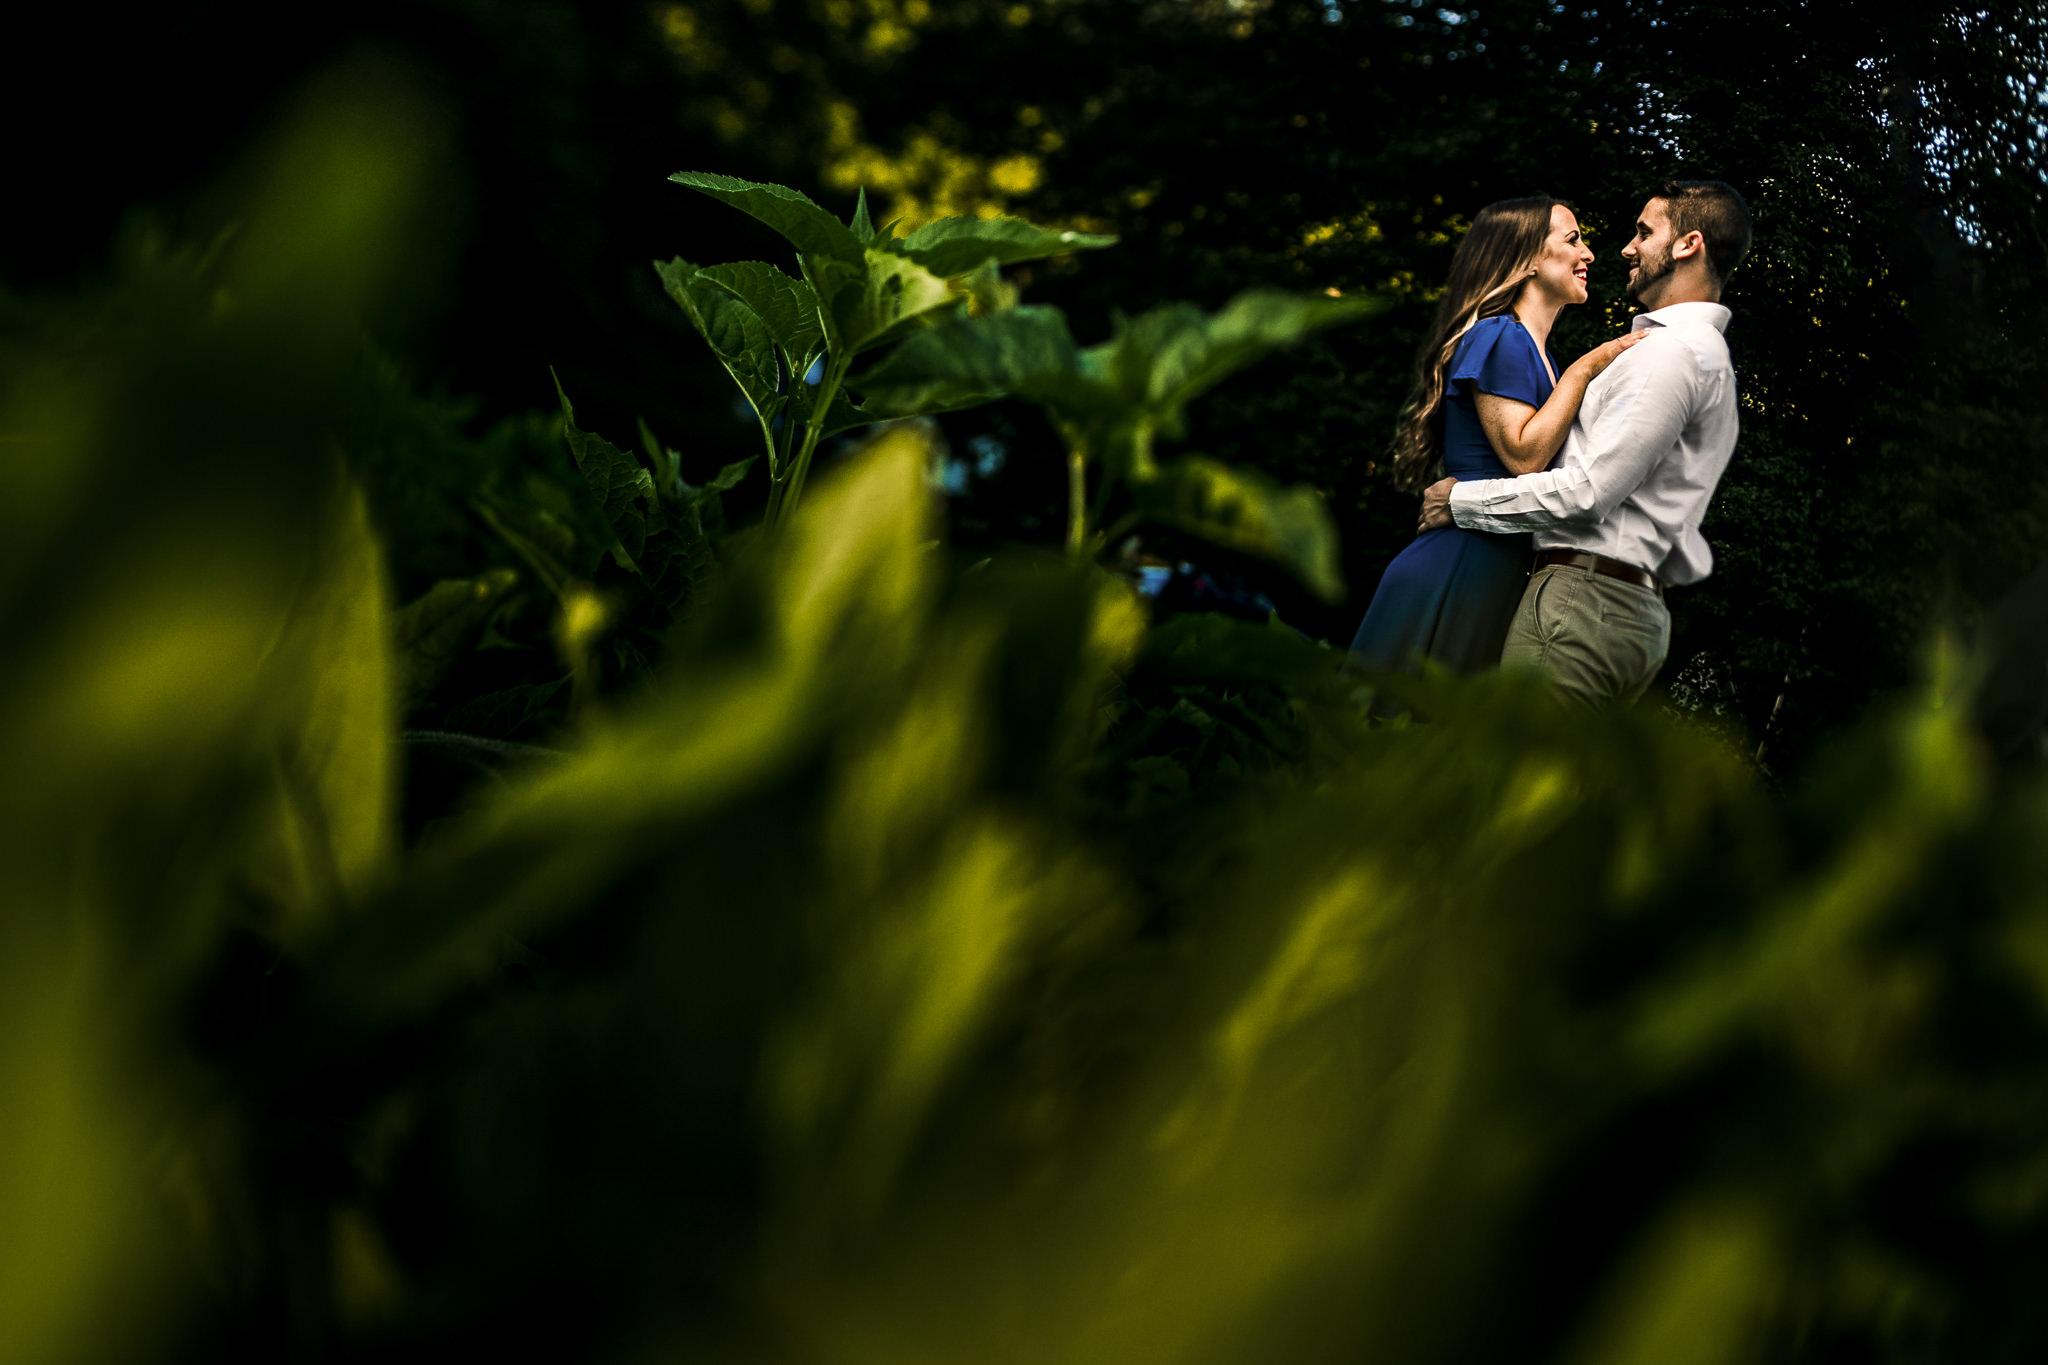 McKowen-Natirar-Park-Engagement-Photos-02.JPG